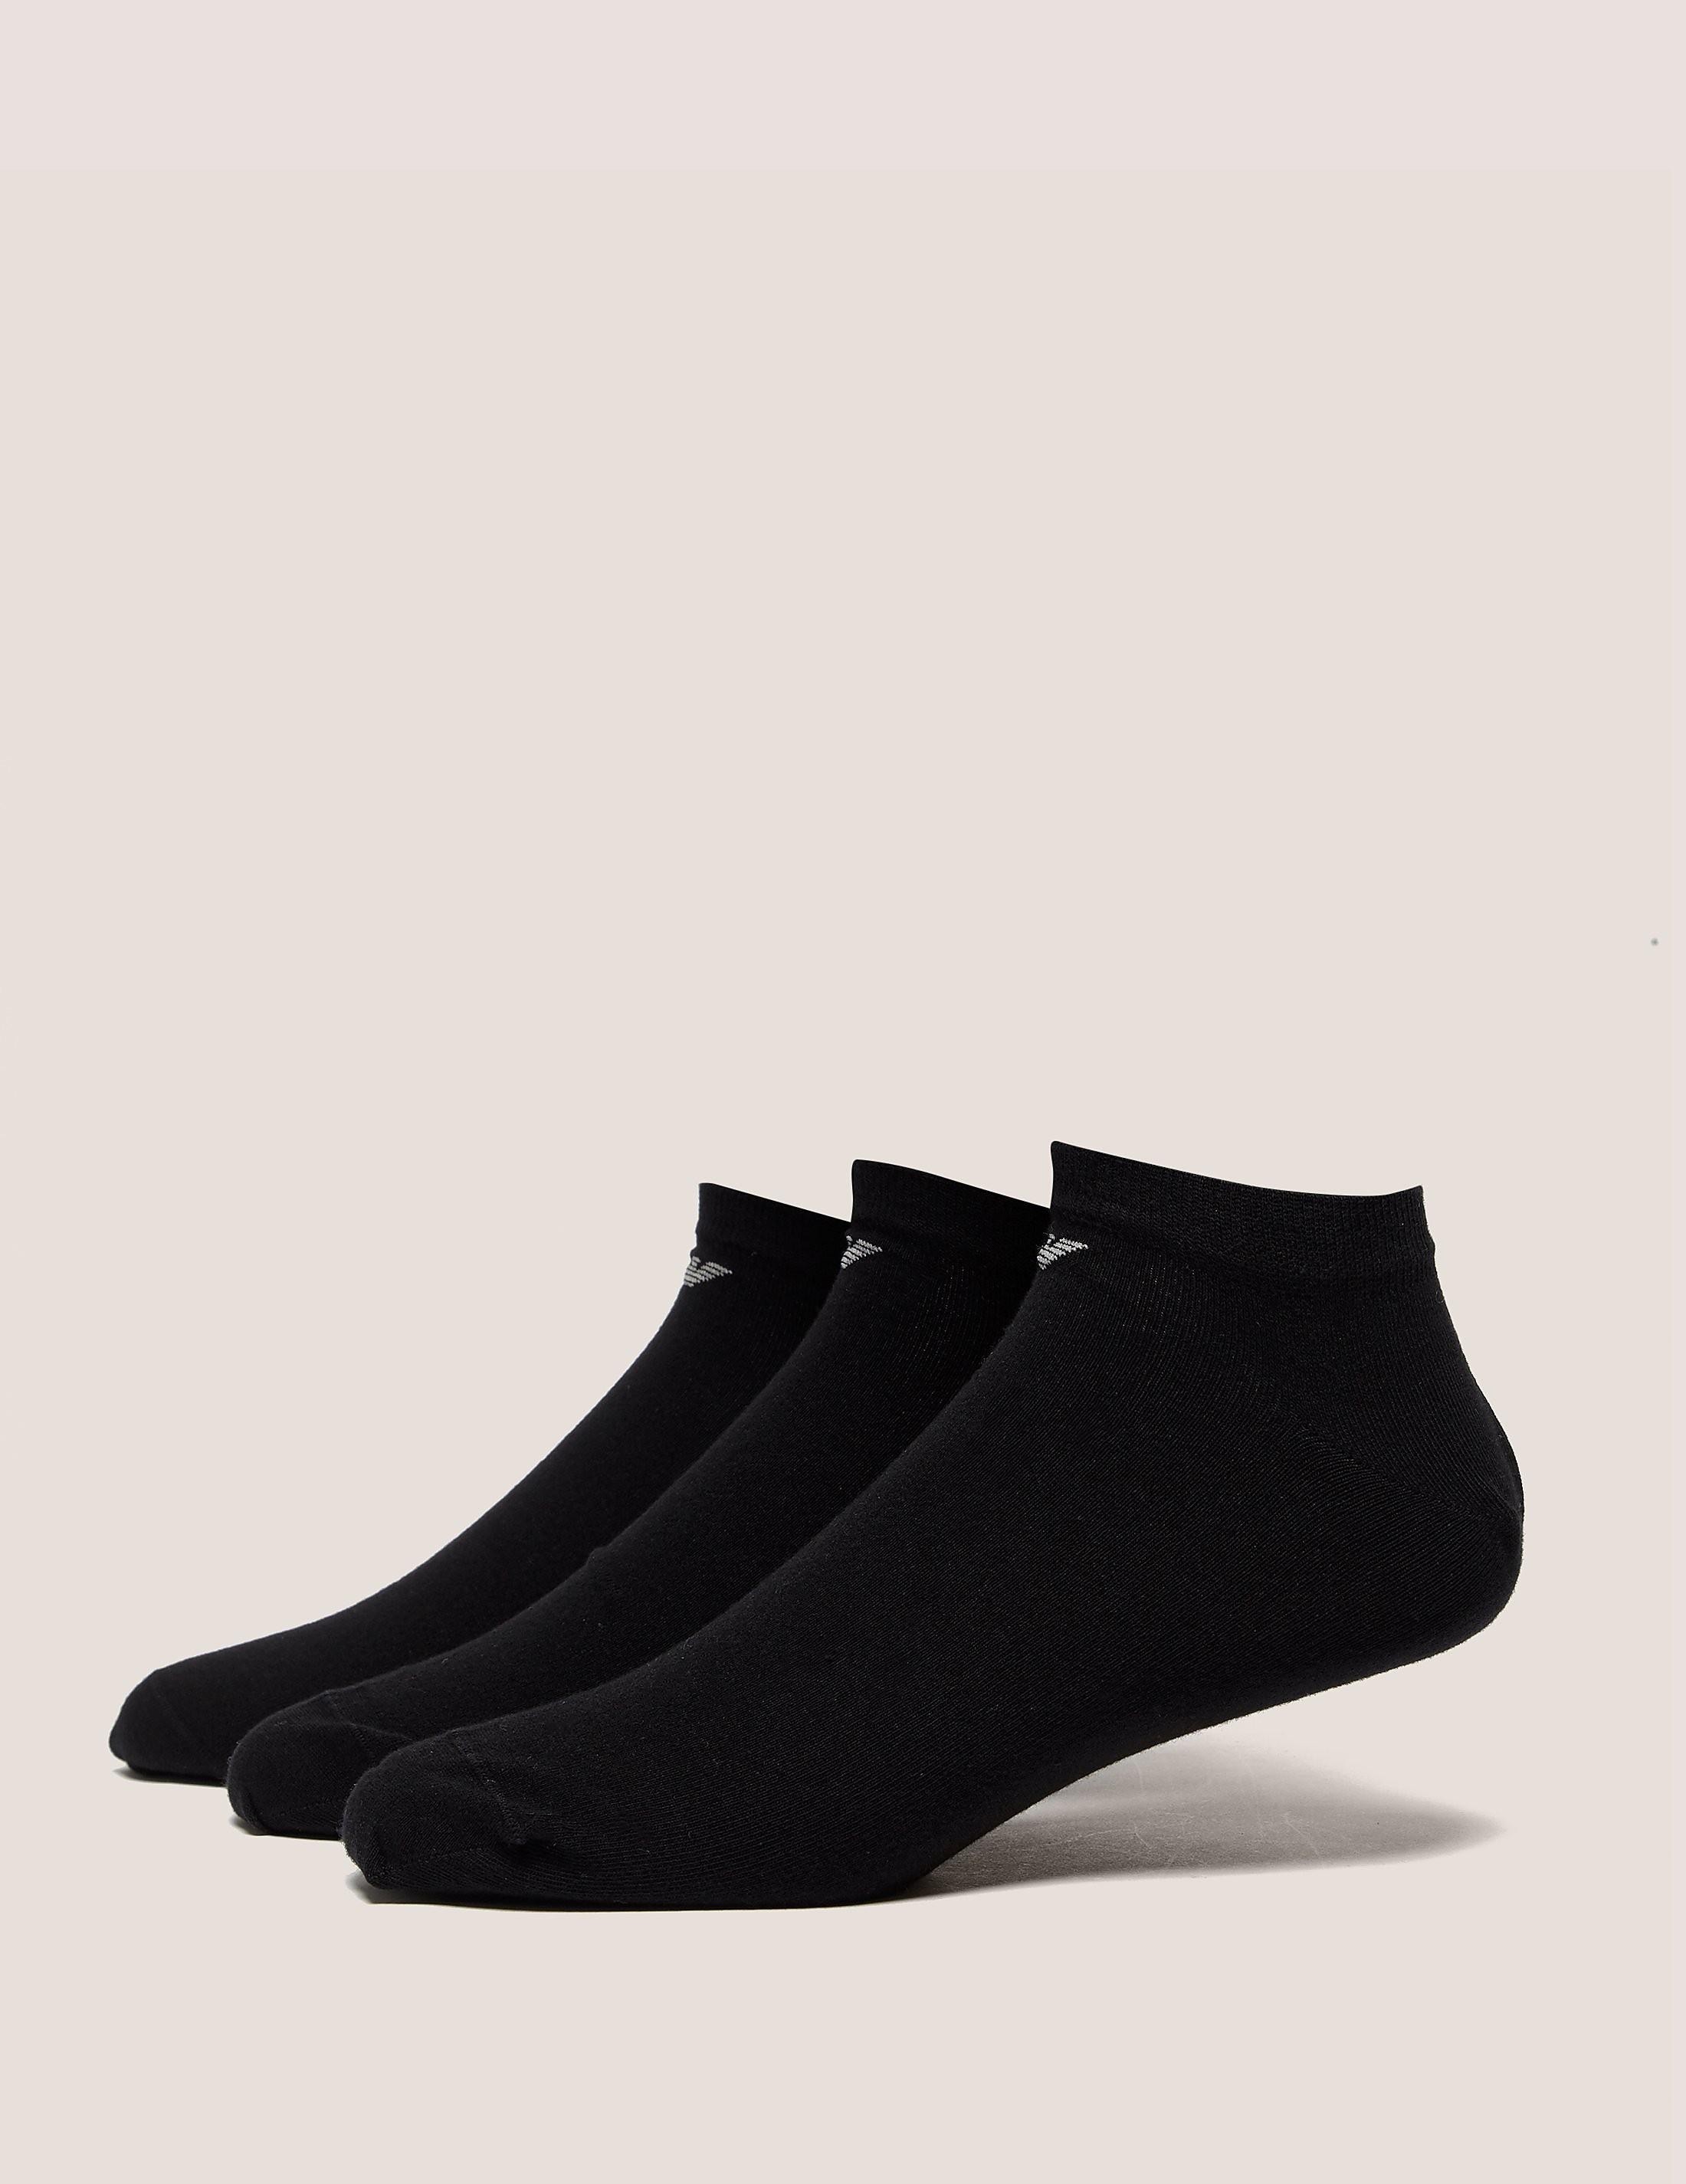 Emporio Armani 3-Pack Trainer Sock